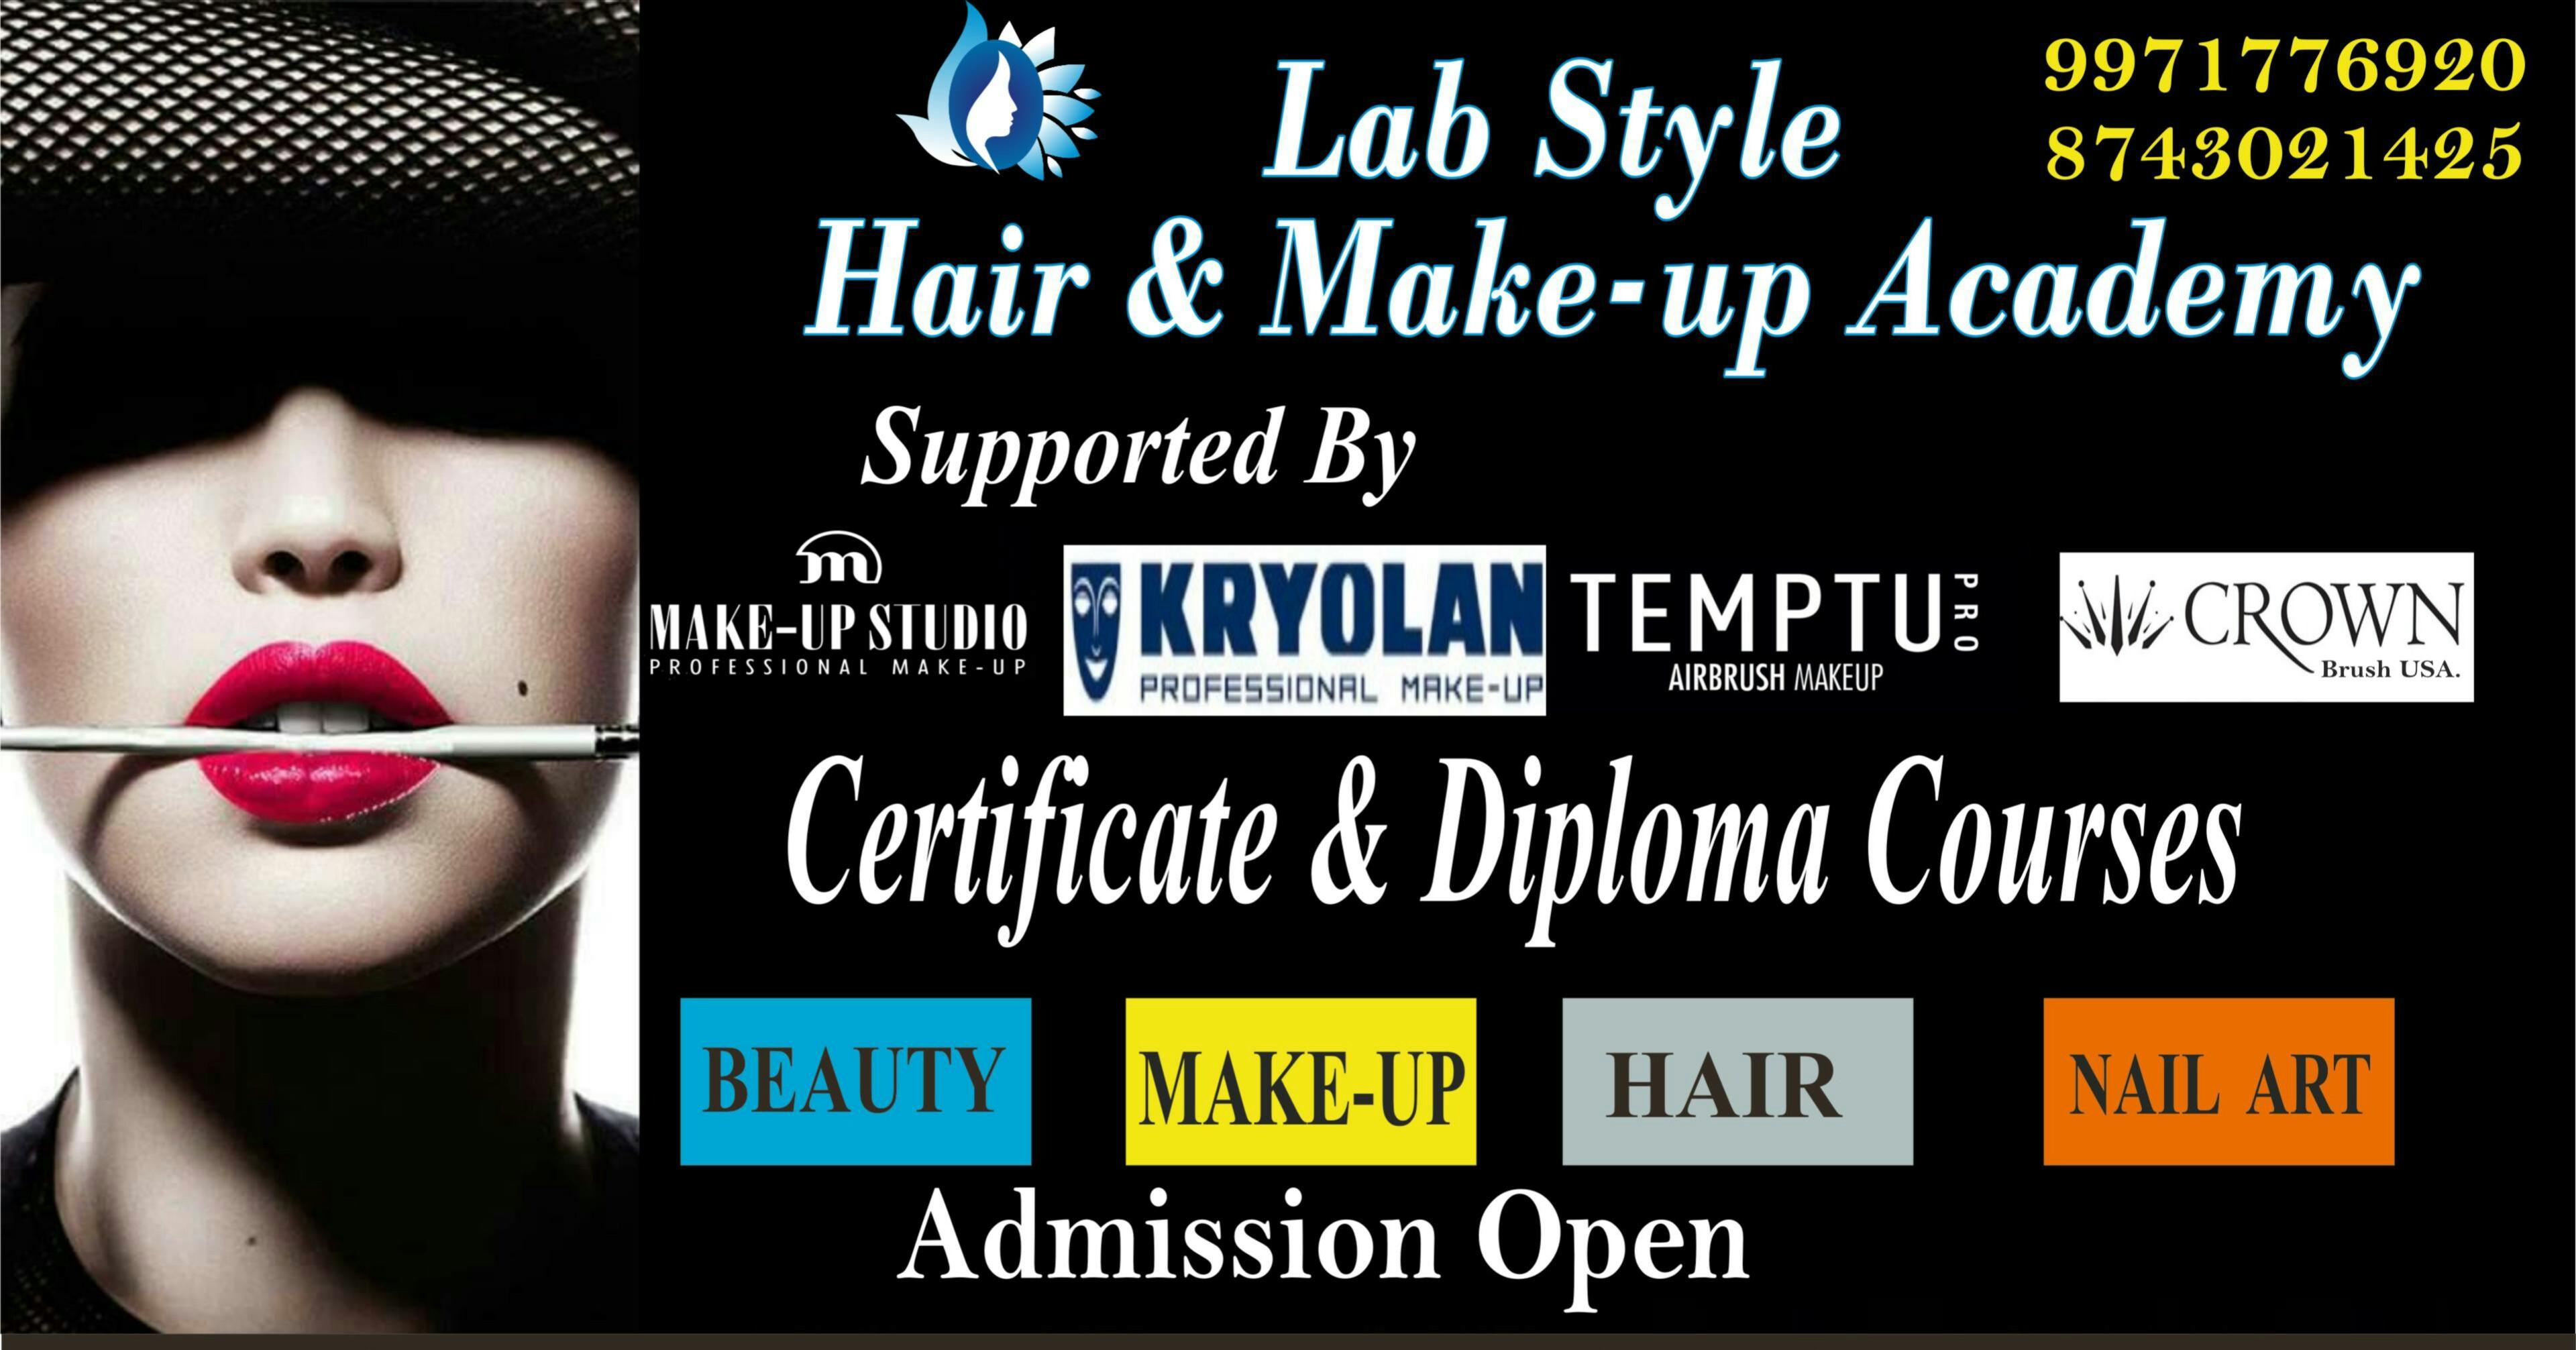 lab style Makeup academy in Shahpur Bamheta, Ghaziabad